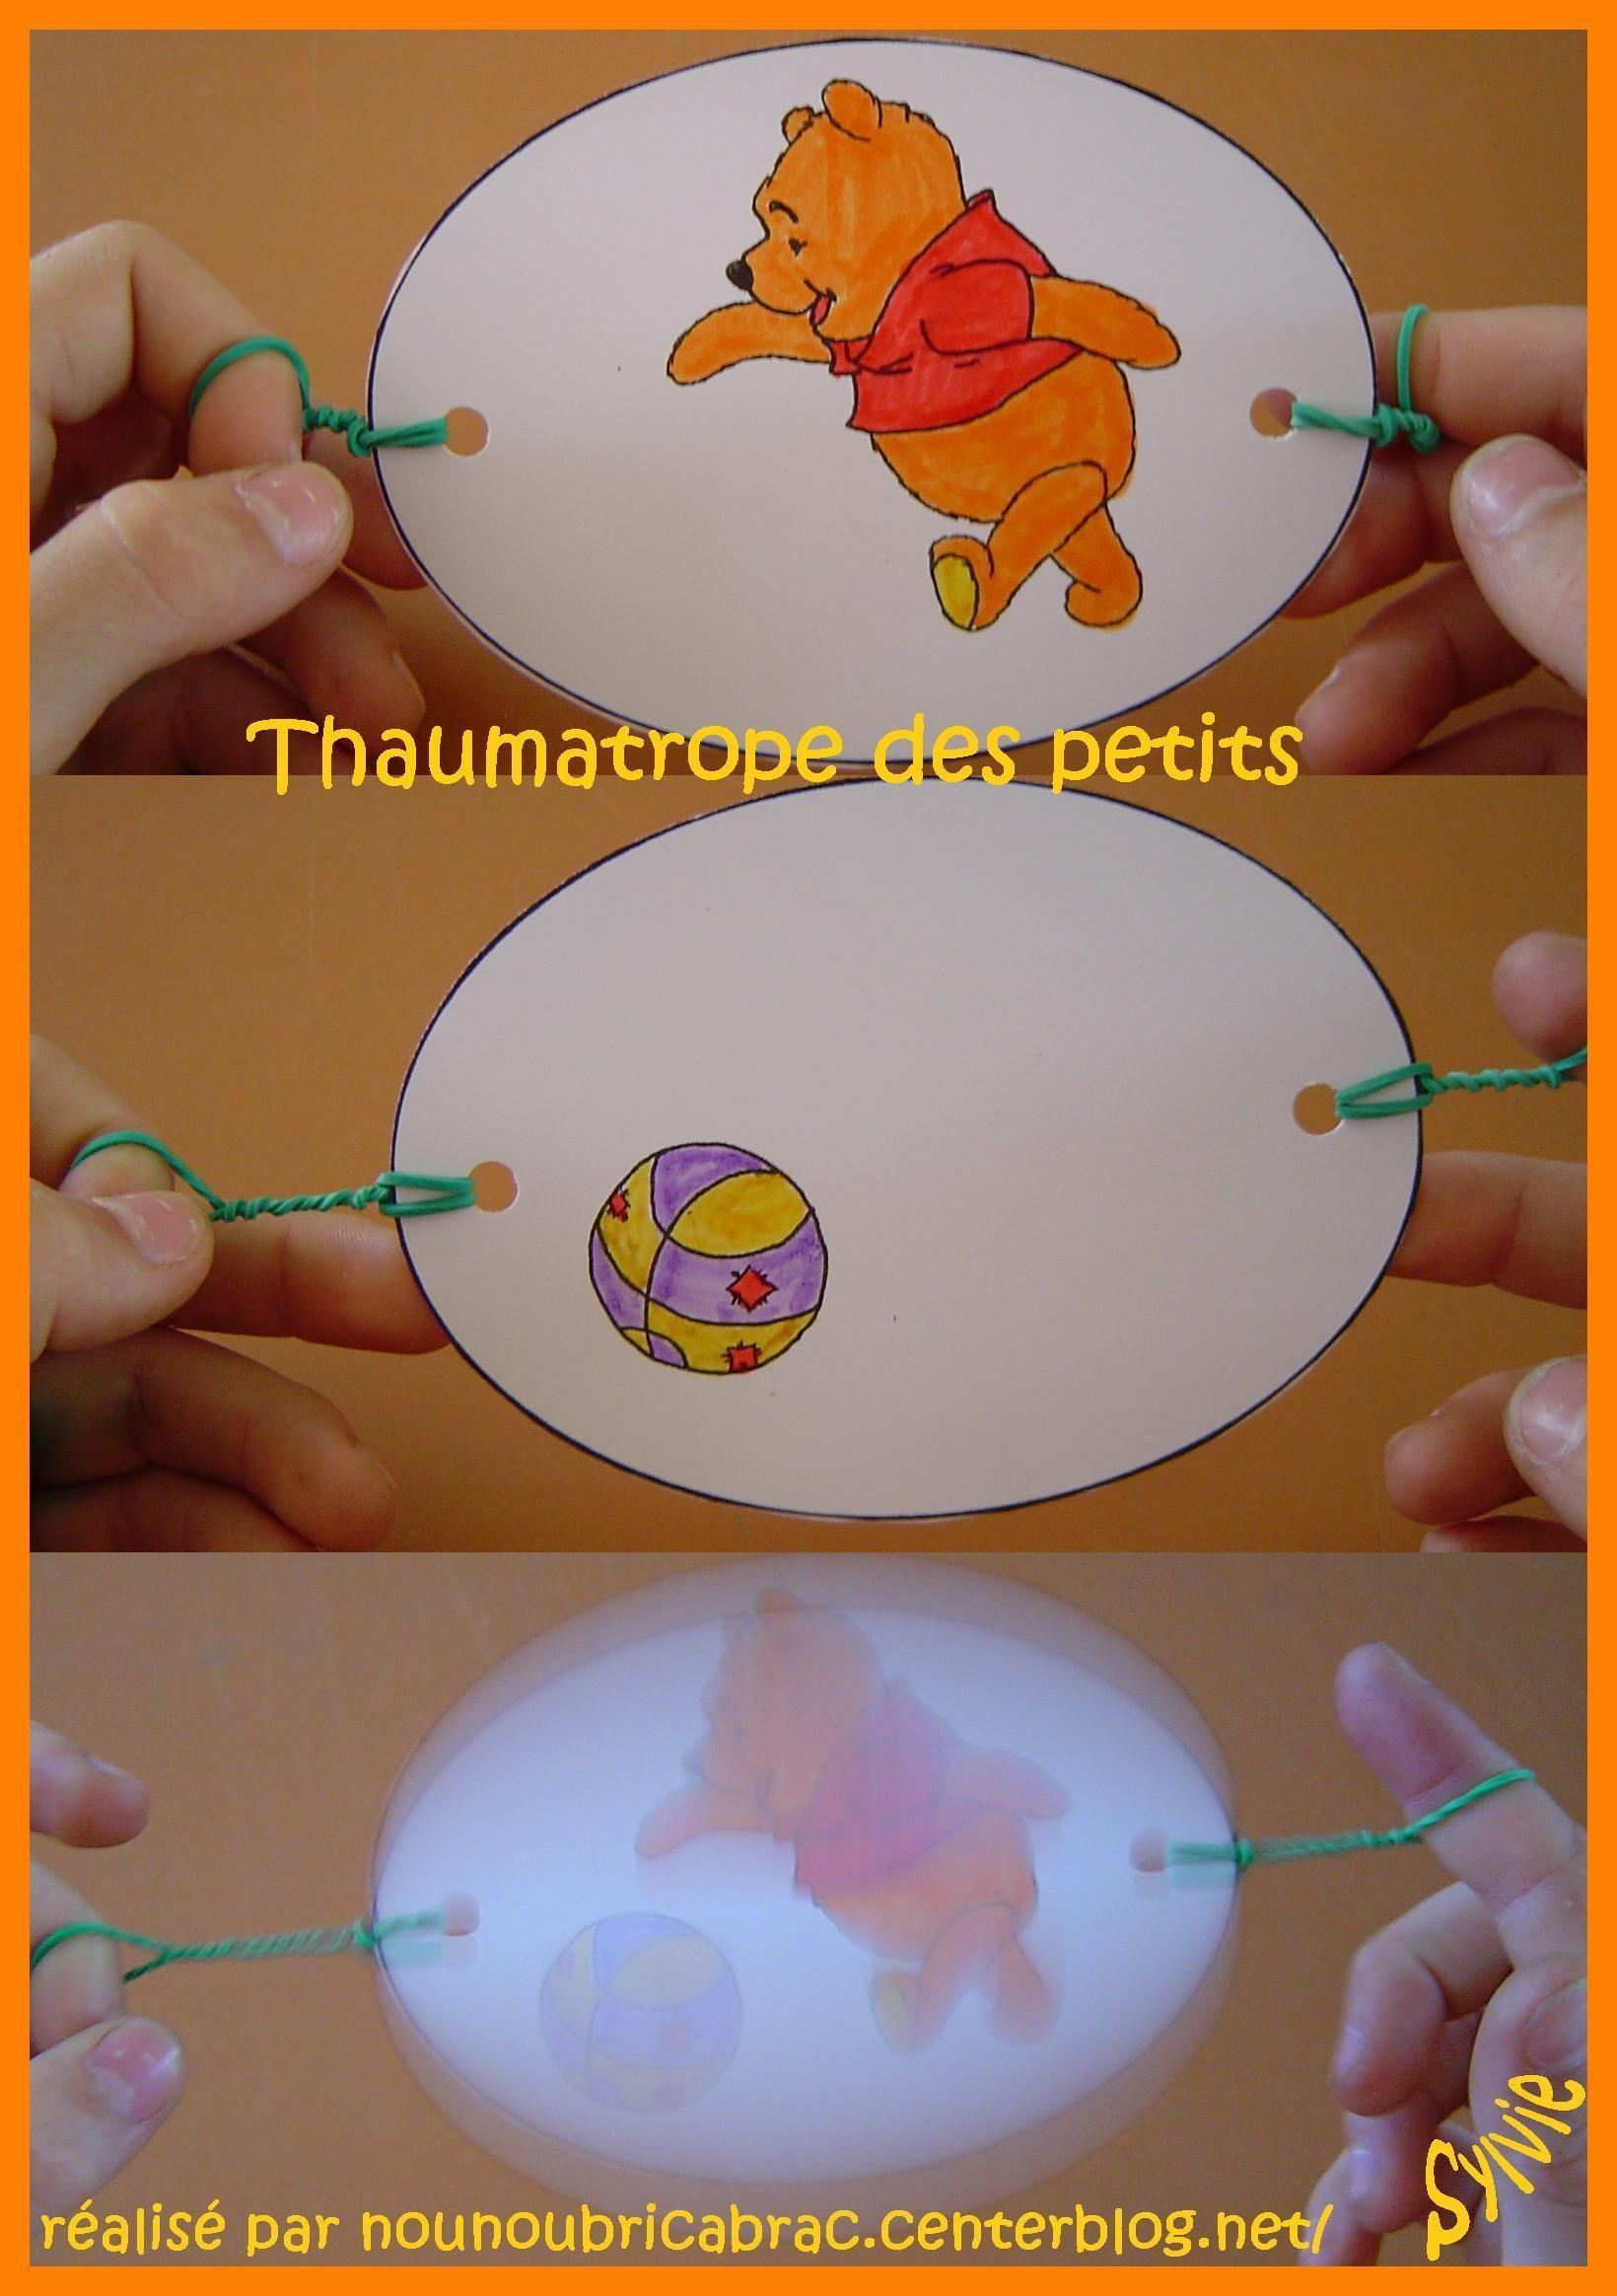 Thaumatrope Action !!!